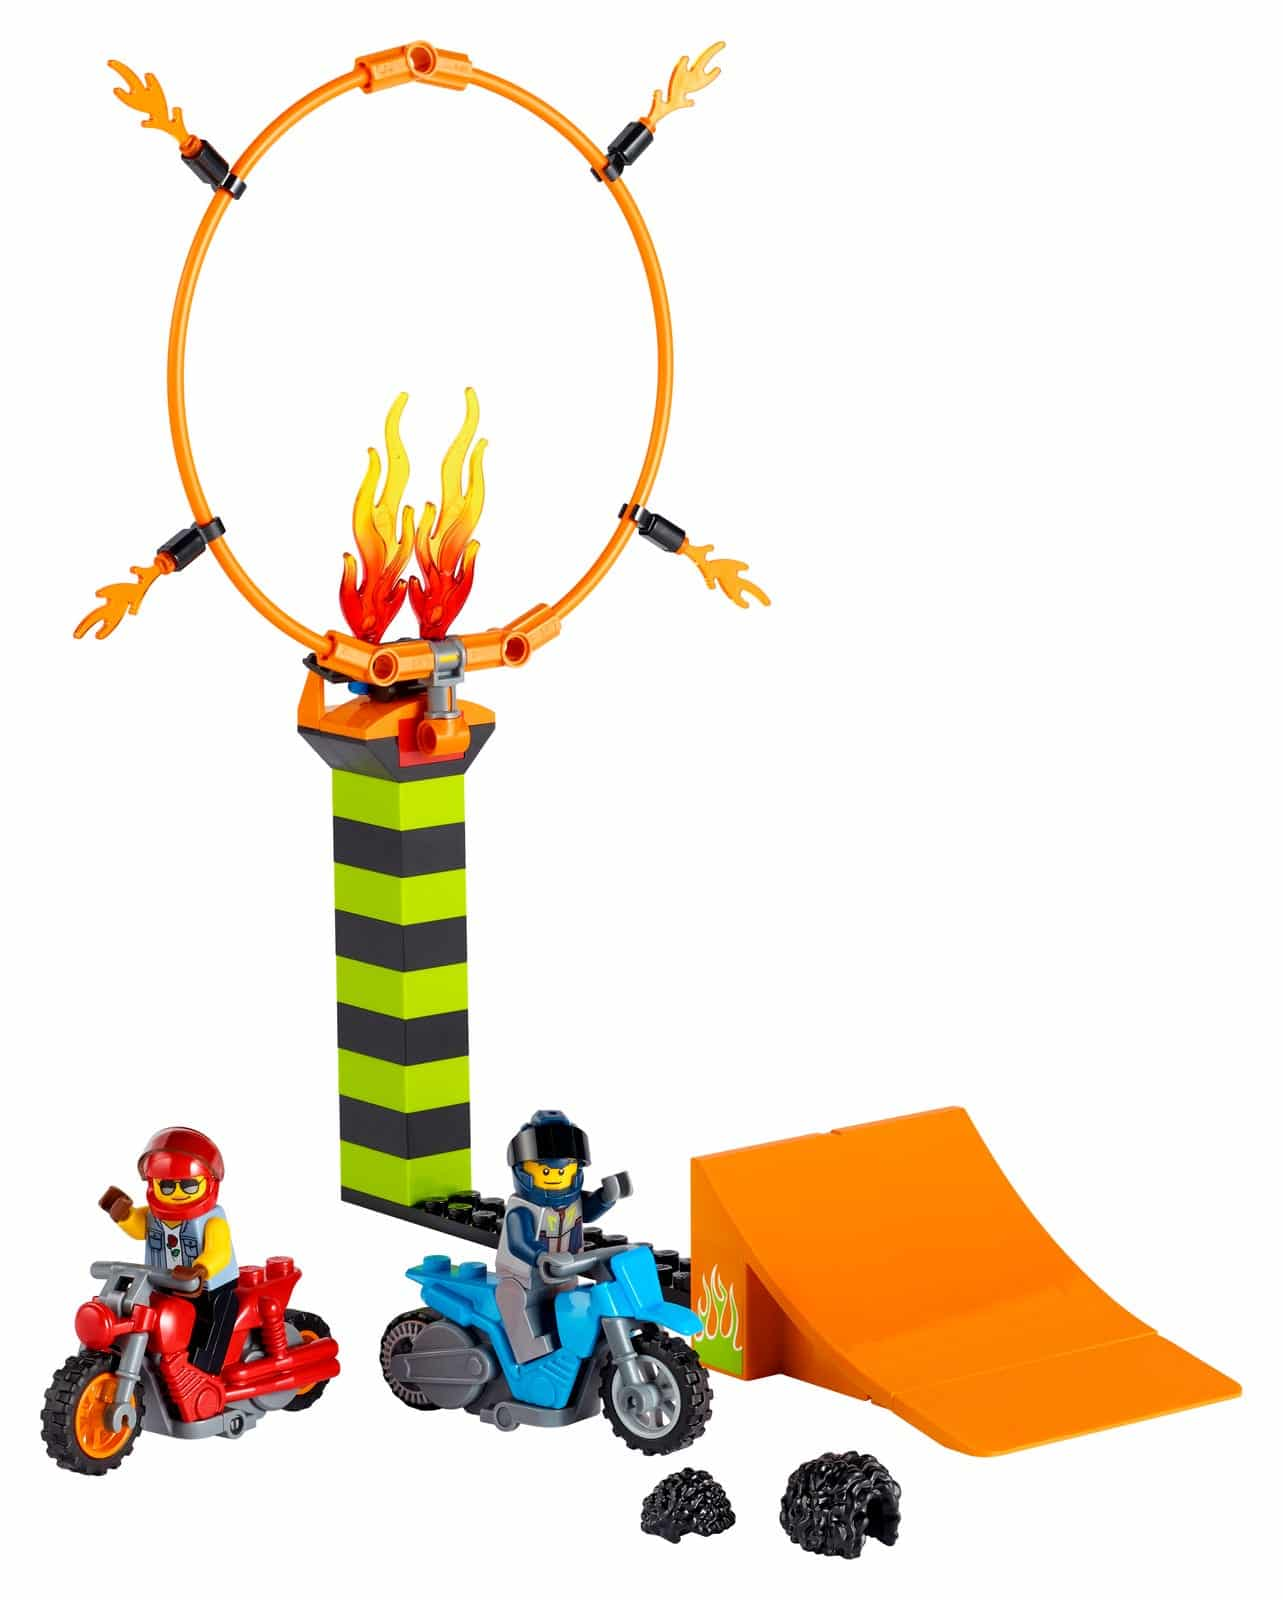 LEGO introduces flywheel-powered bikes with LEGO City Stuntz sets 23